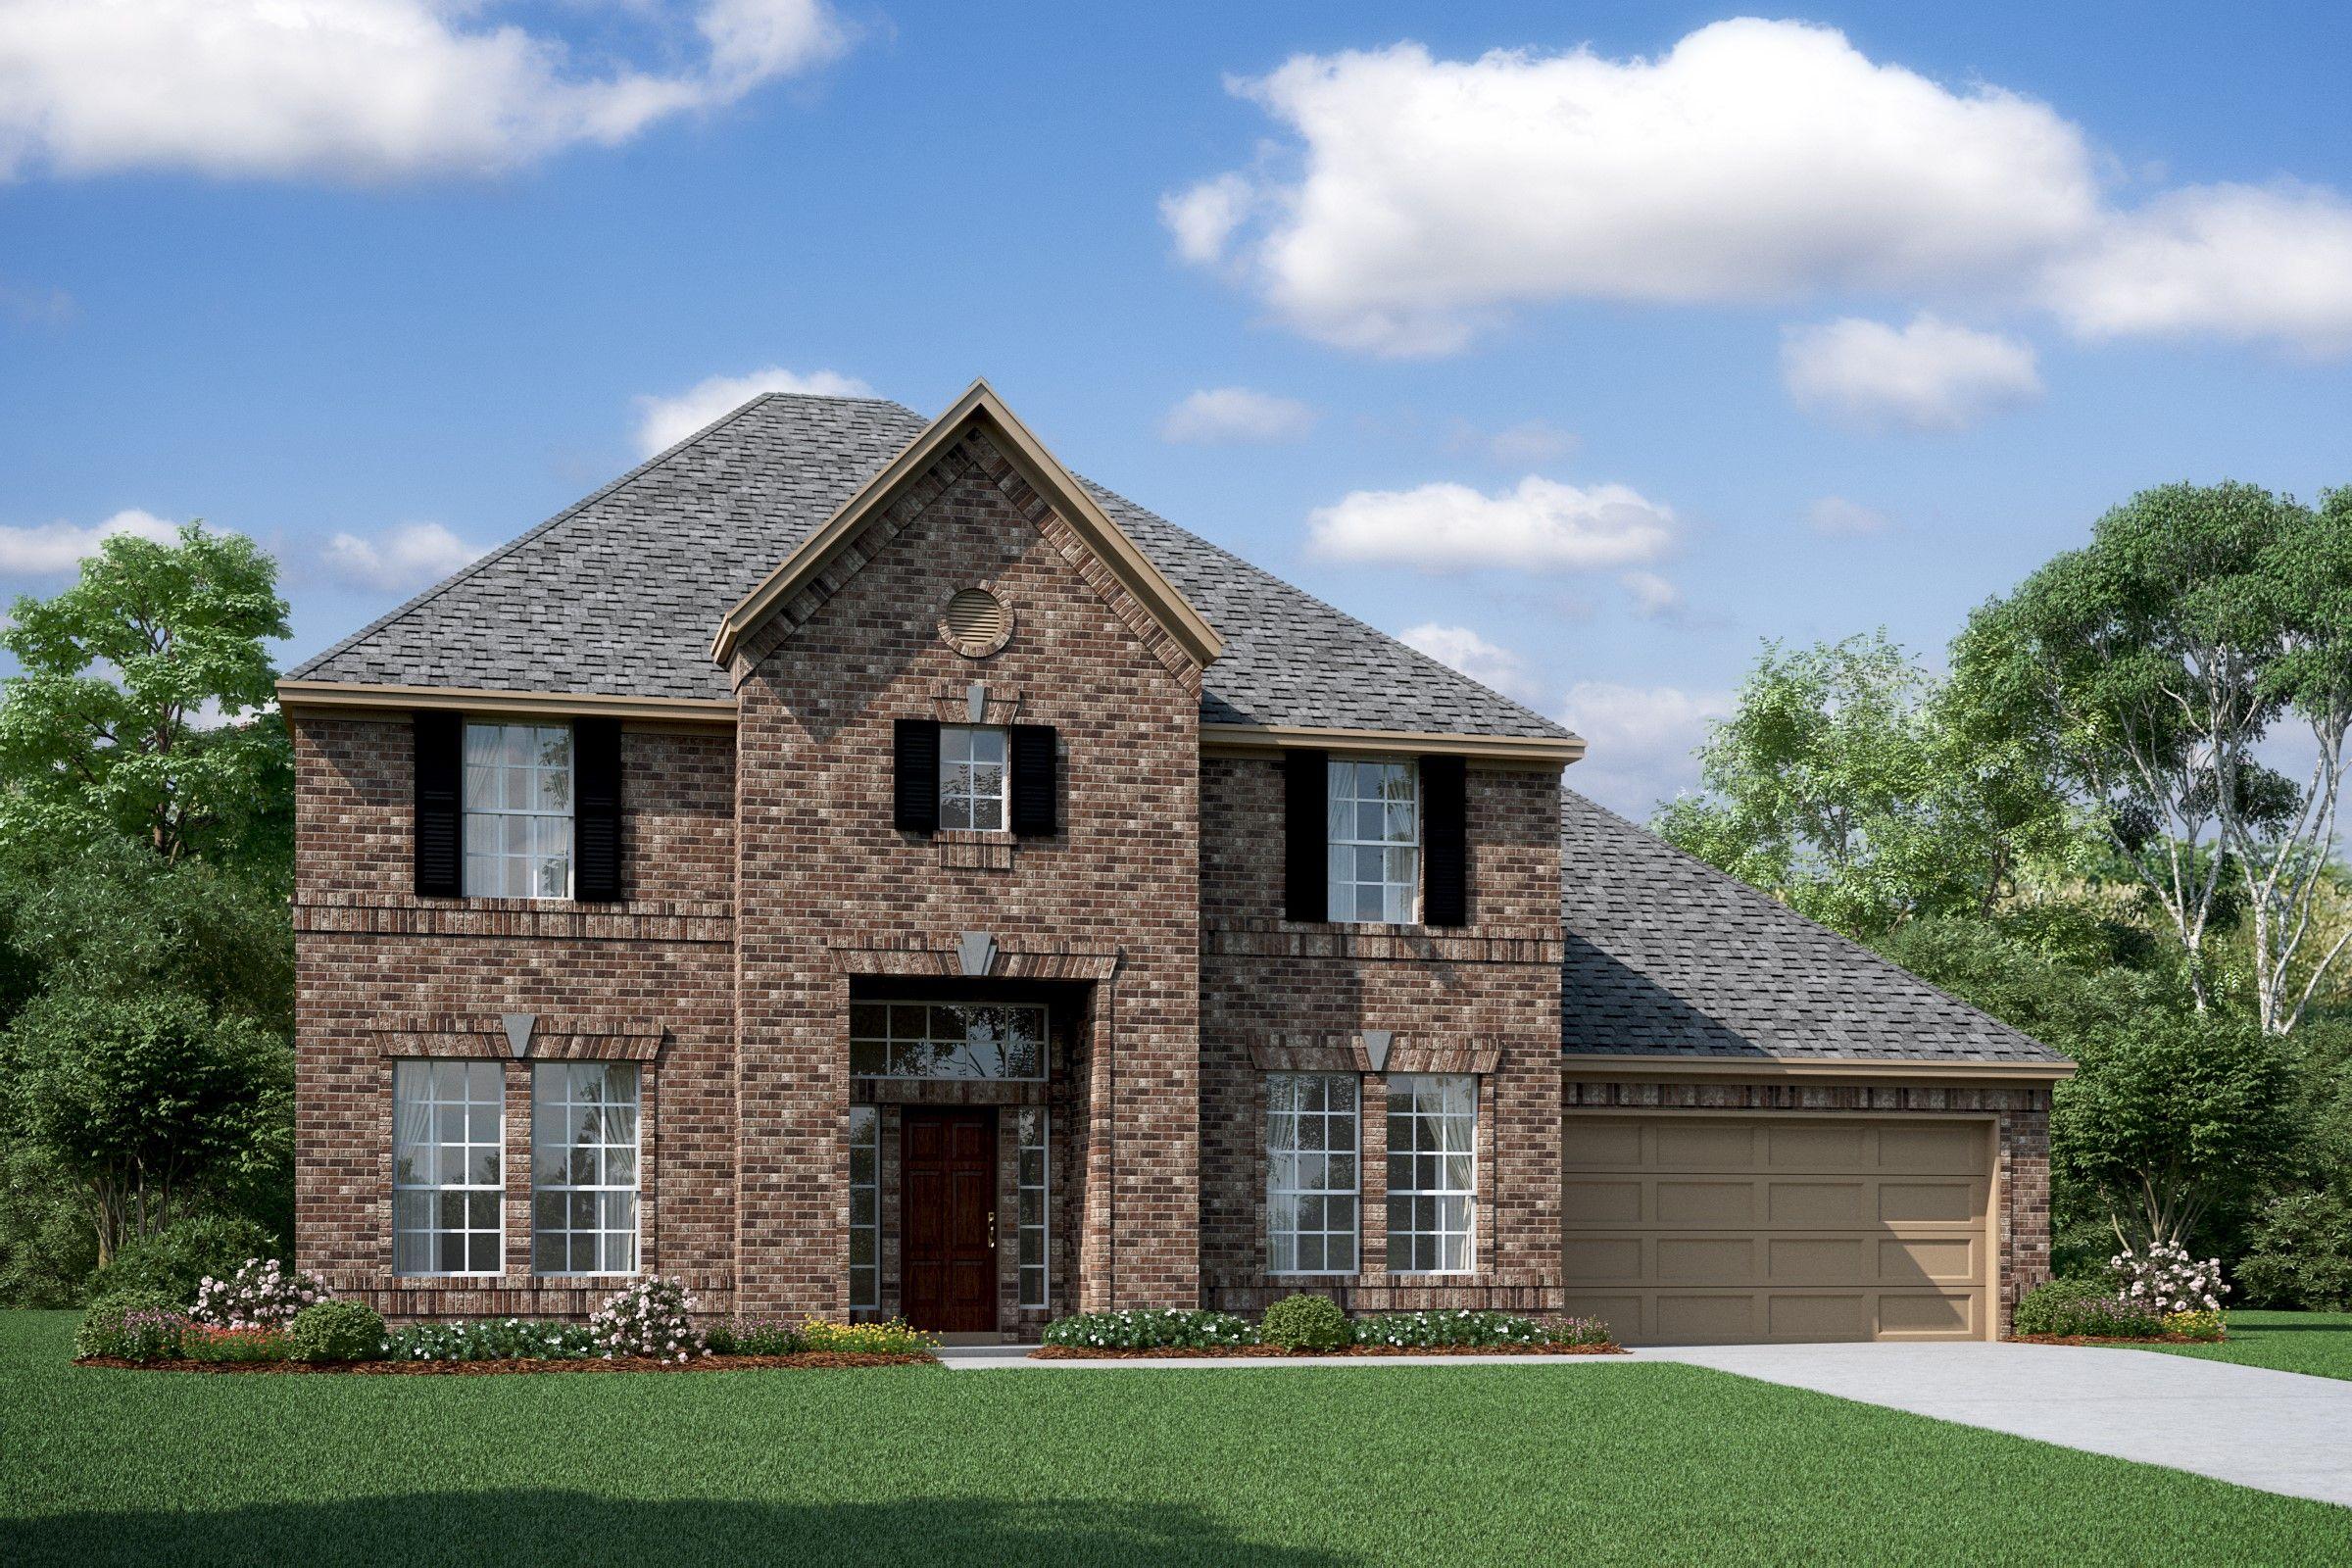 Single Family for Sale at Thunder Bay - Caroline Mccollum Park Rd & Thunder Bay Beach City, Texas 77523 United States